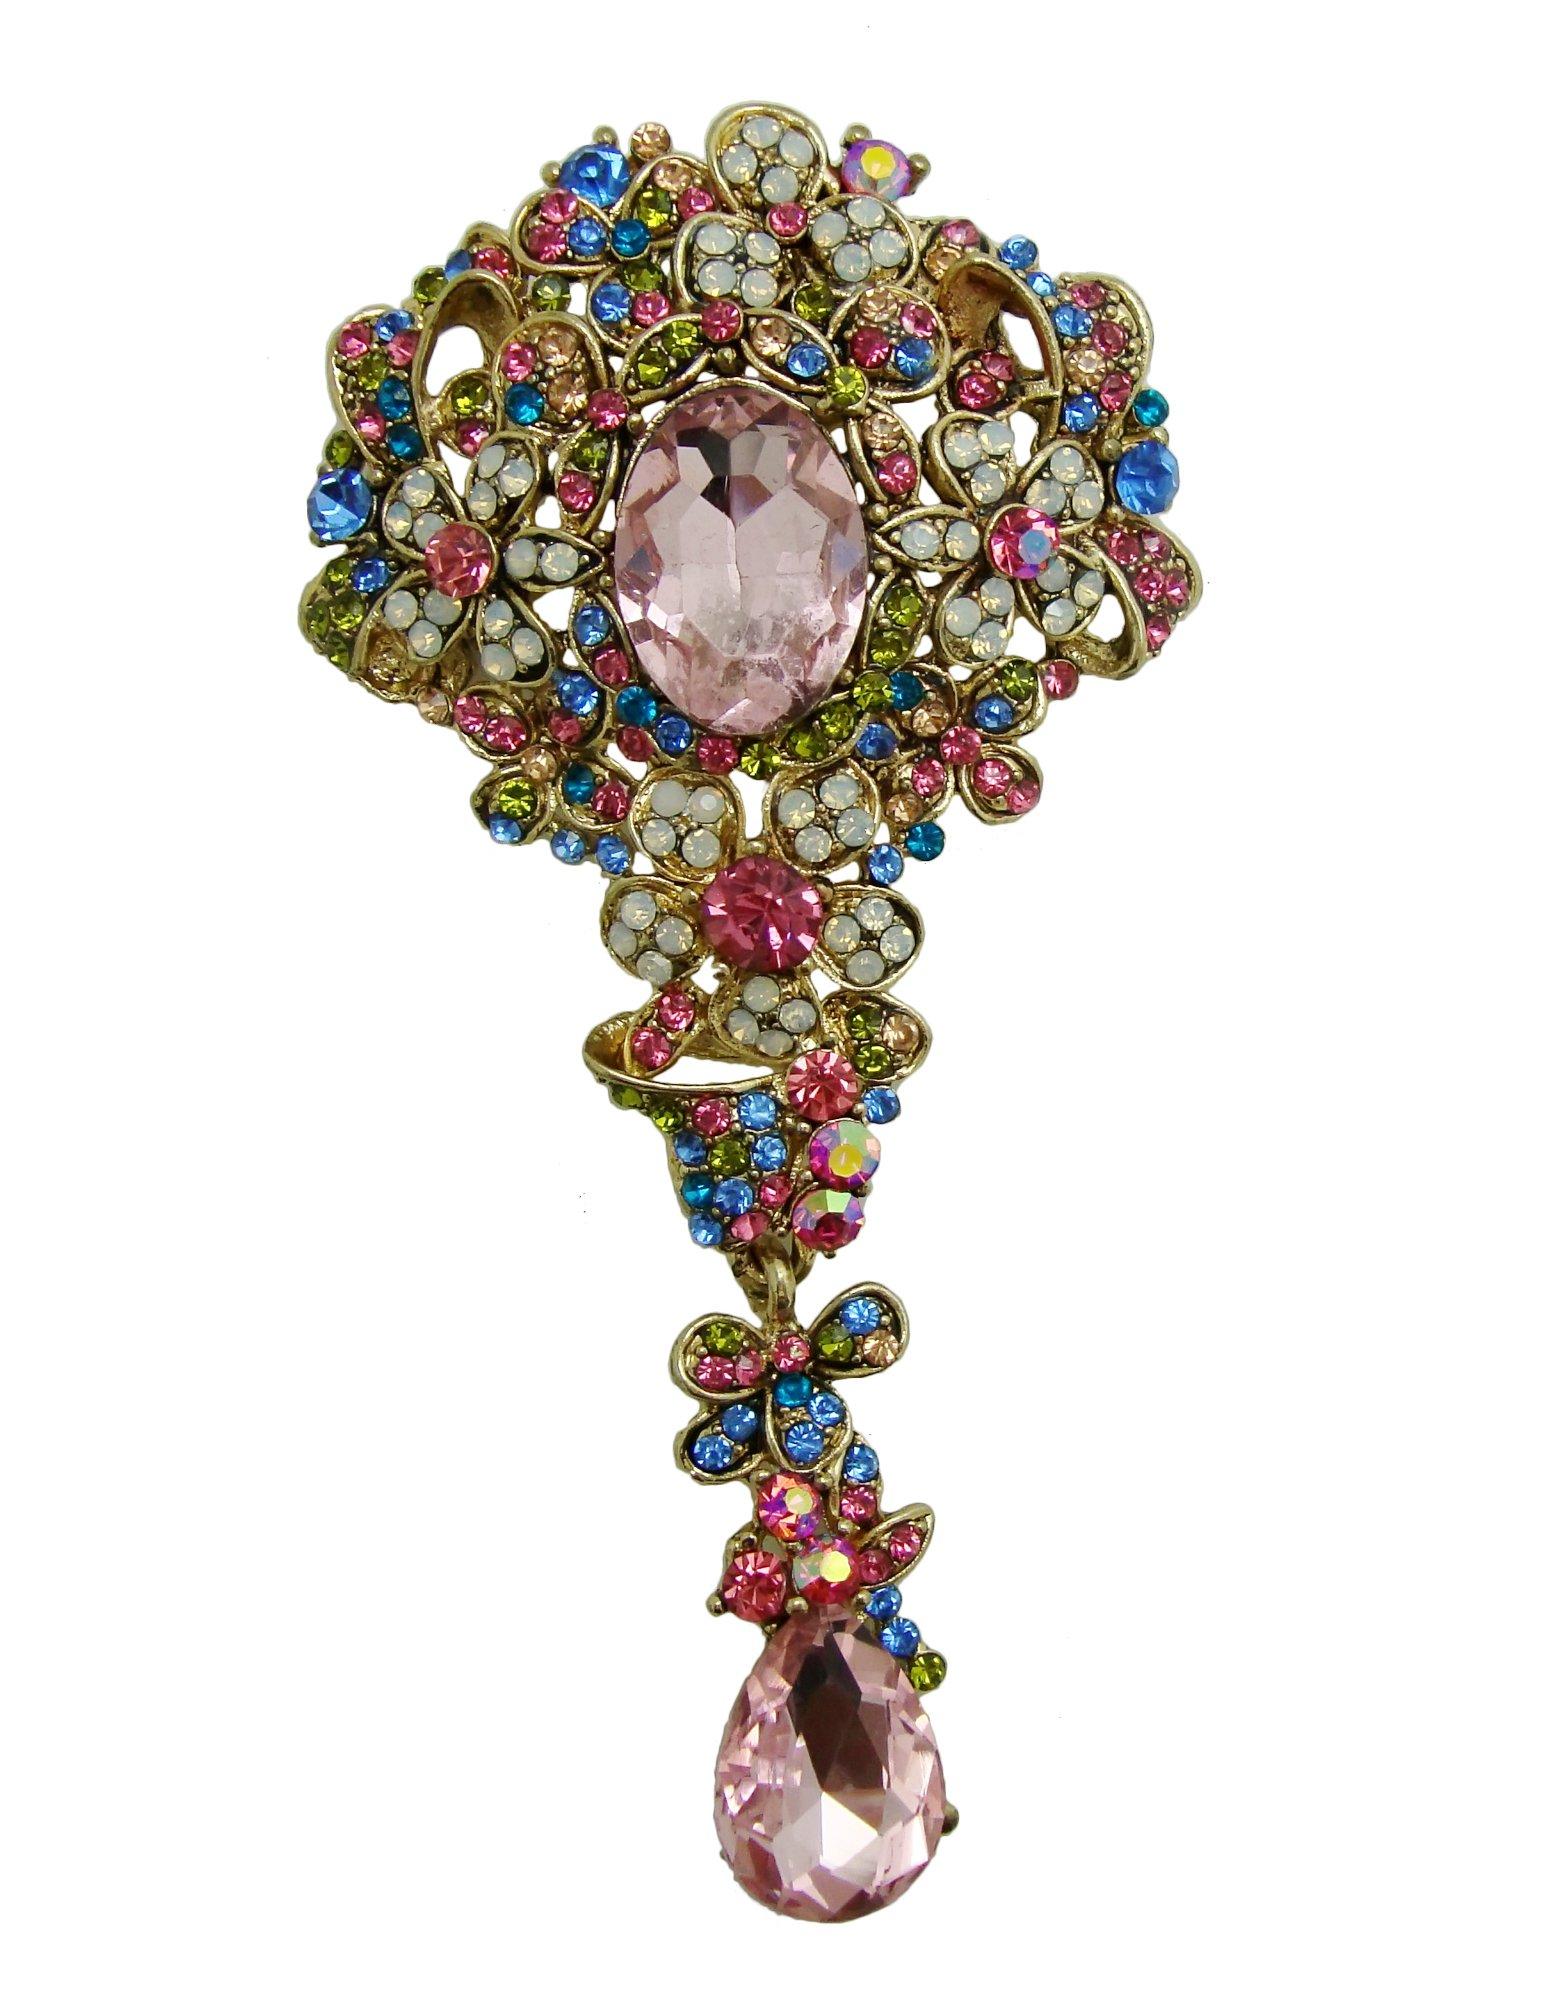 TTjewelry Vintage Style Lots Flowers Drop Austrian Crystal Brooch Pin Rhinestone Pendant (Multi-color)